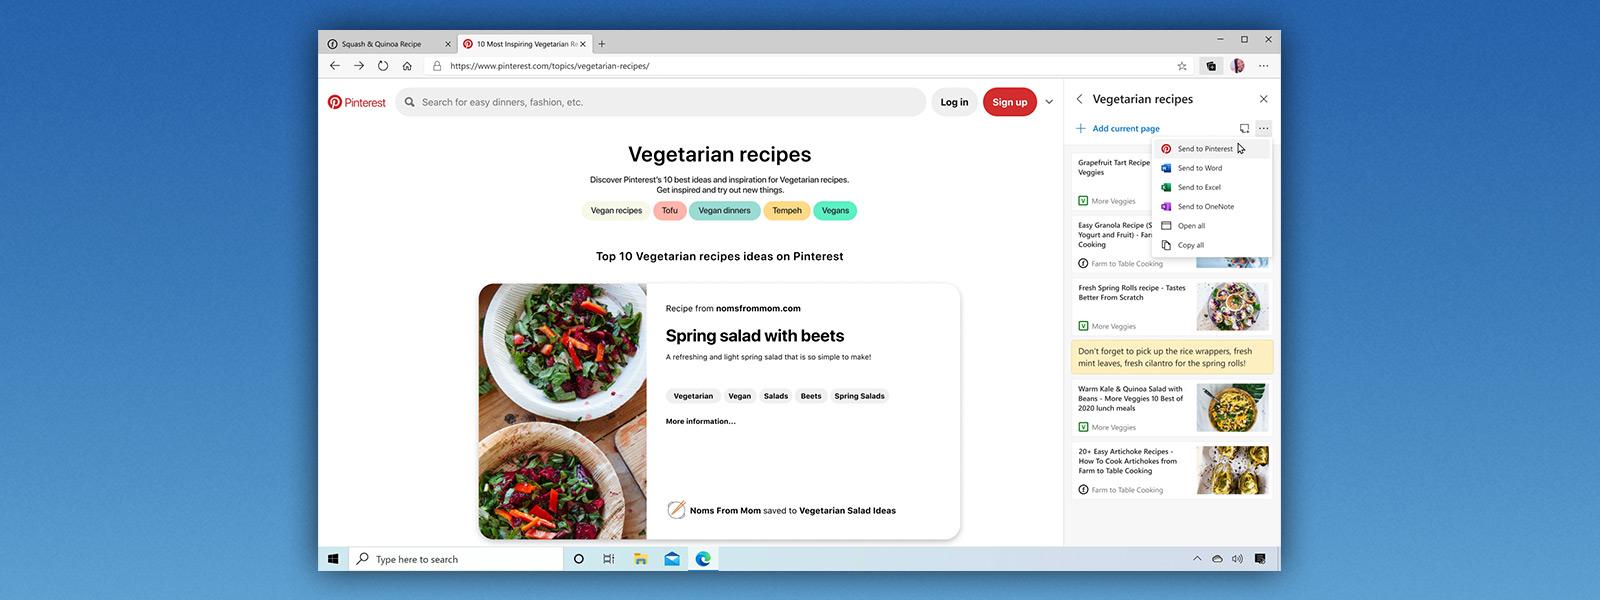 Microsoft Edge browser with tab displaying webpage of vegetarian recipes